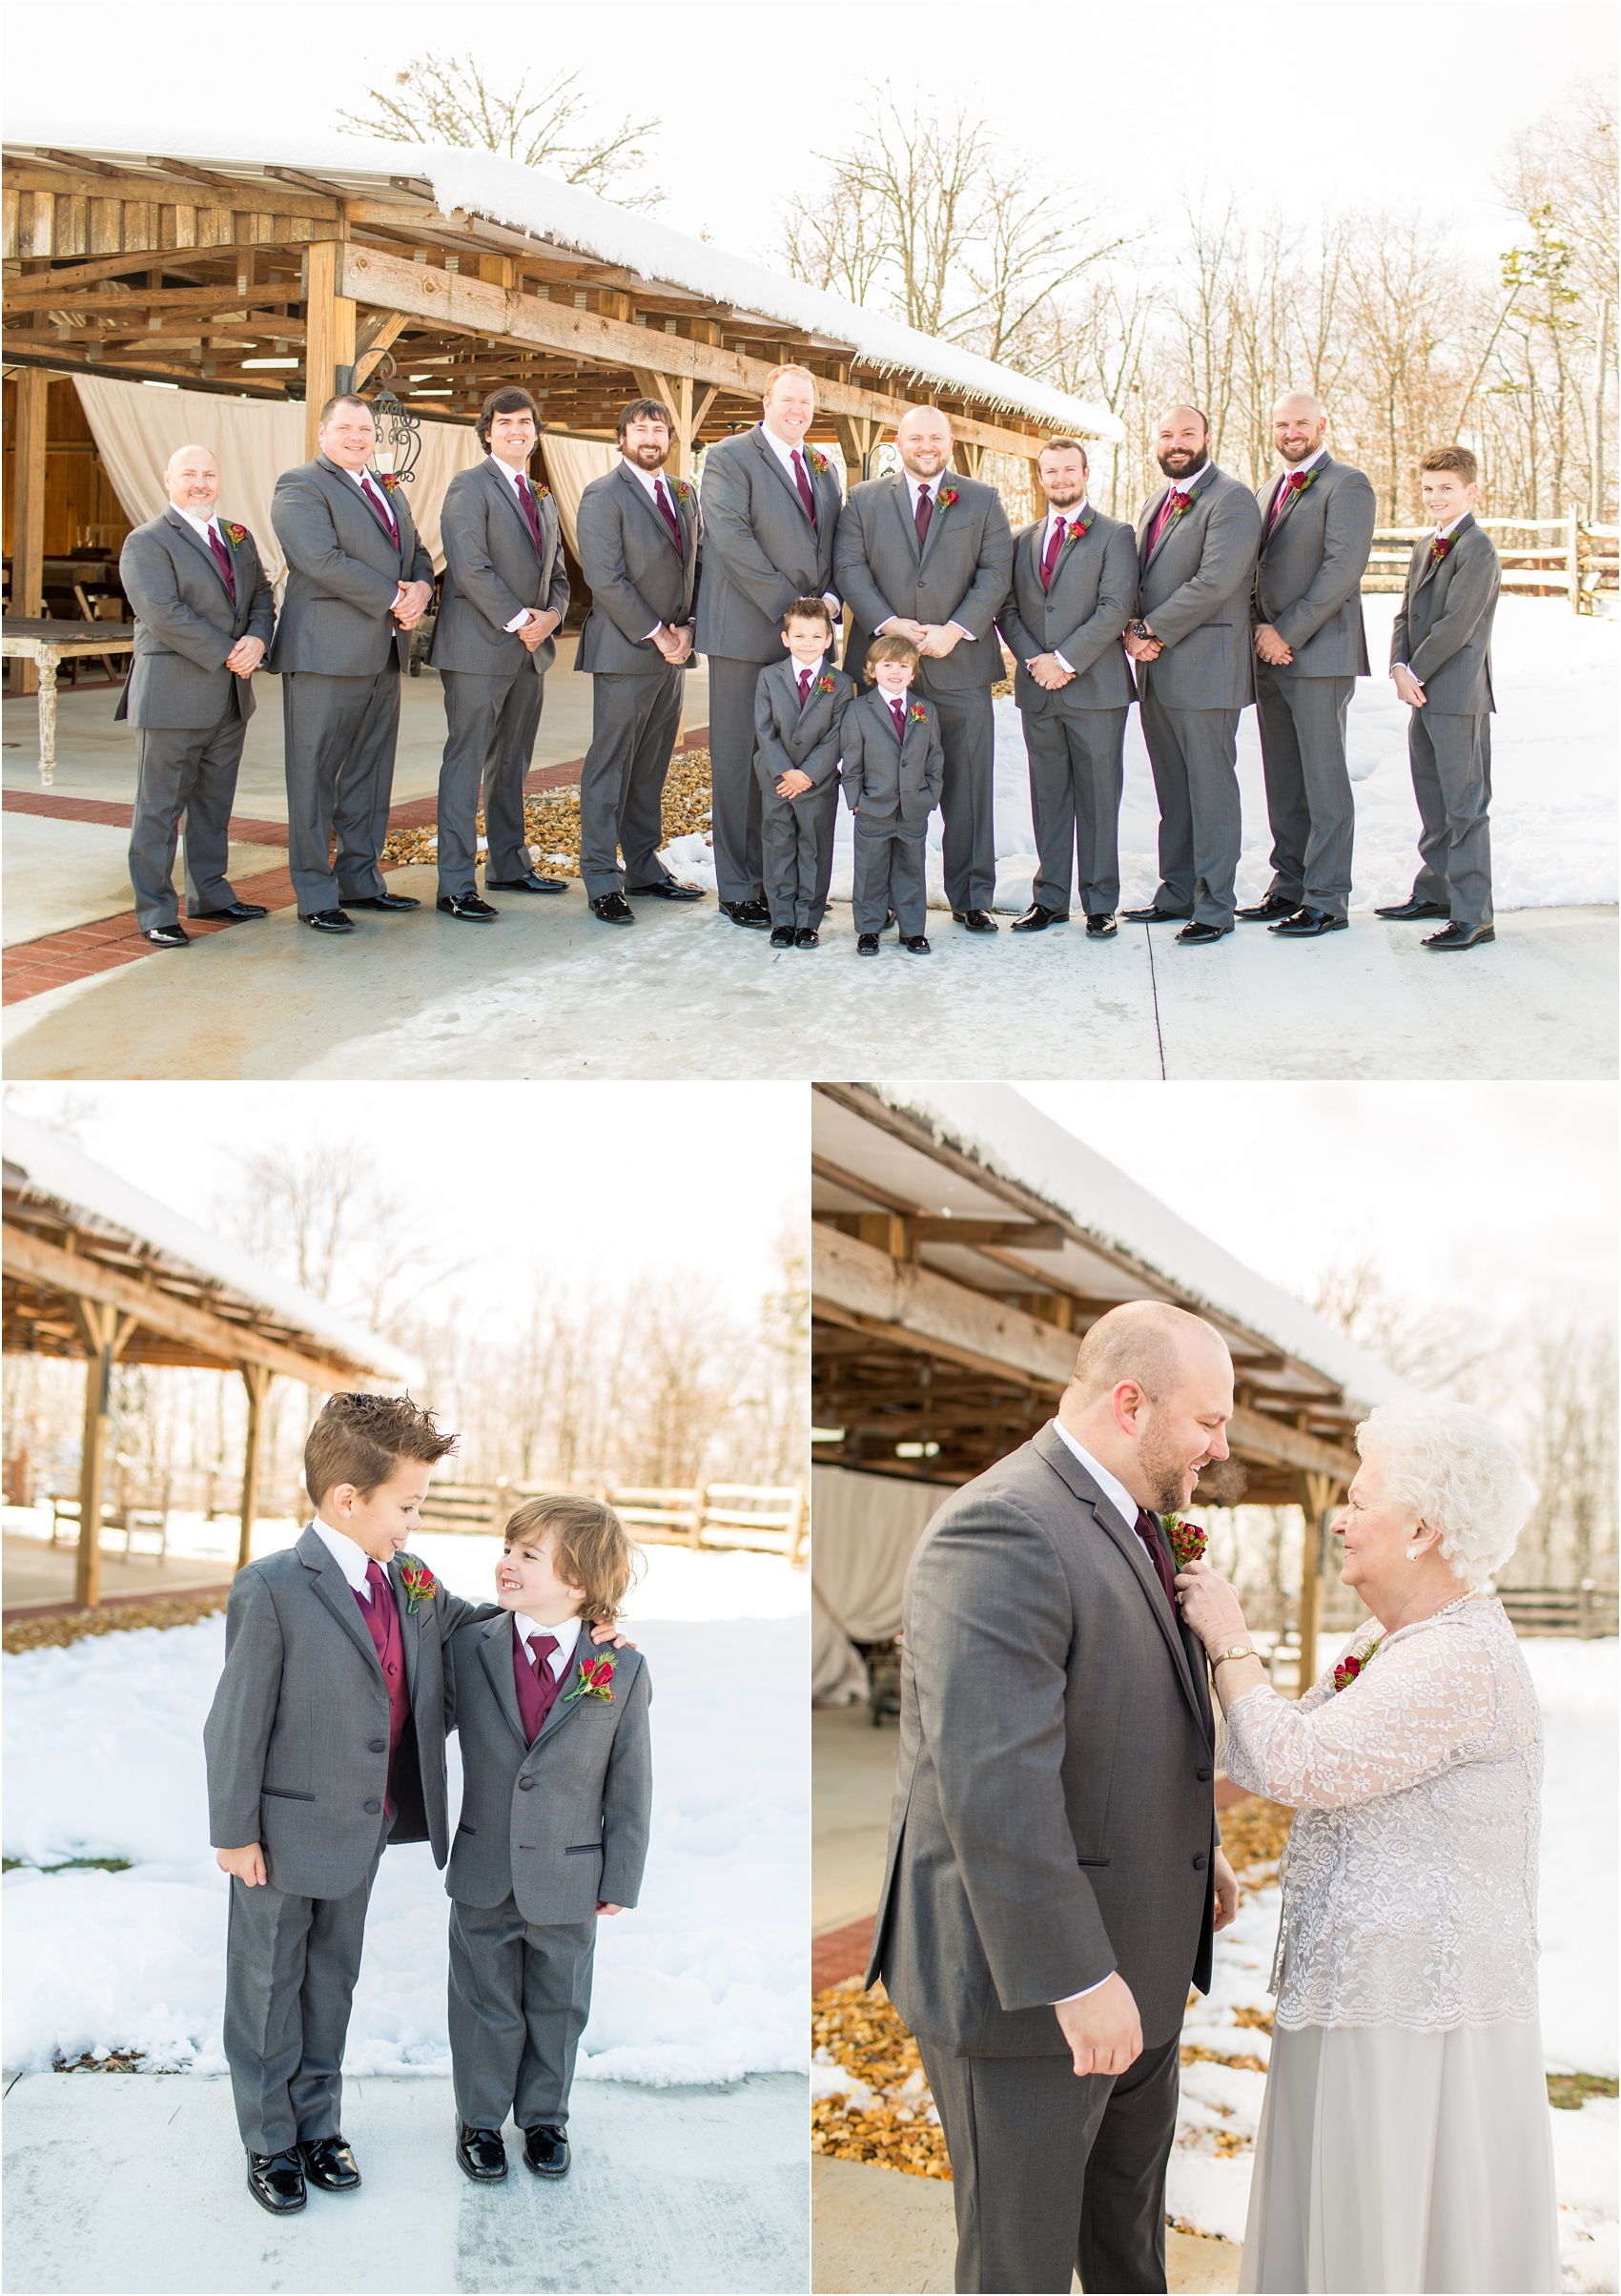 Savannah Eve Photography- Page Wedding Blog-48.jpg